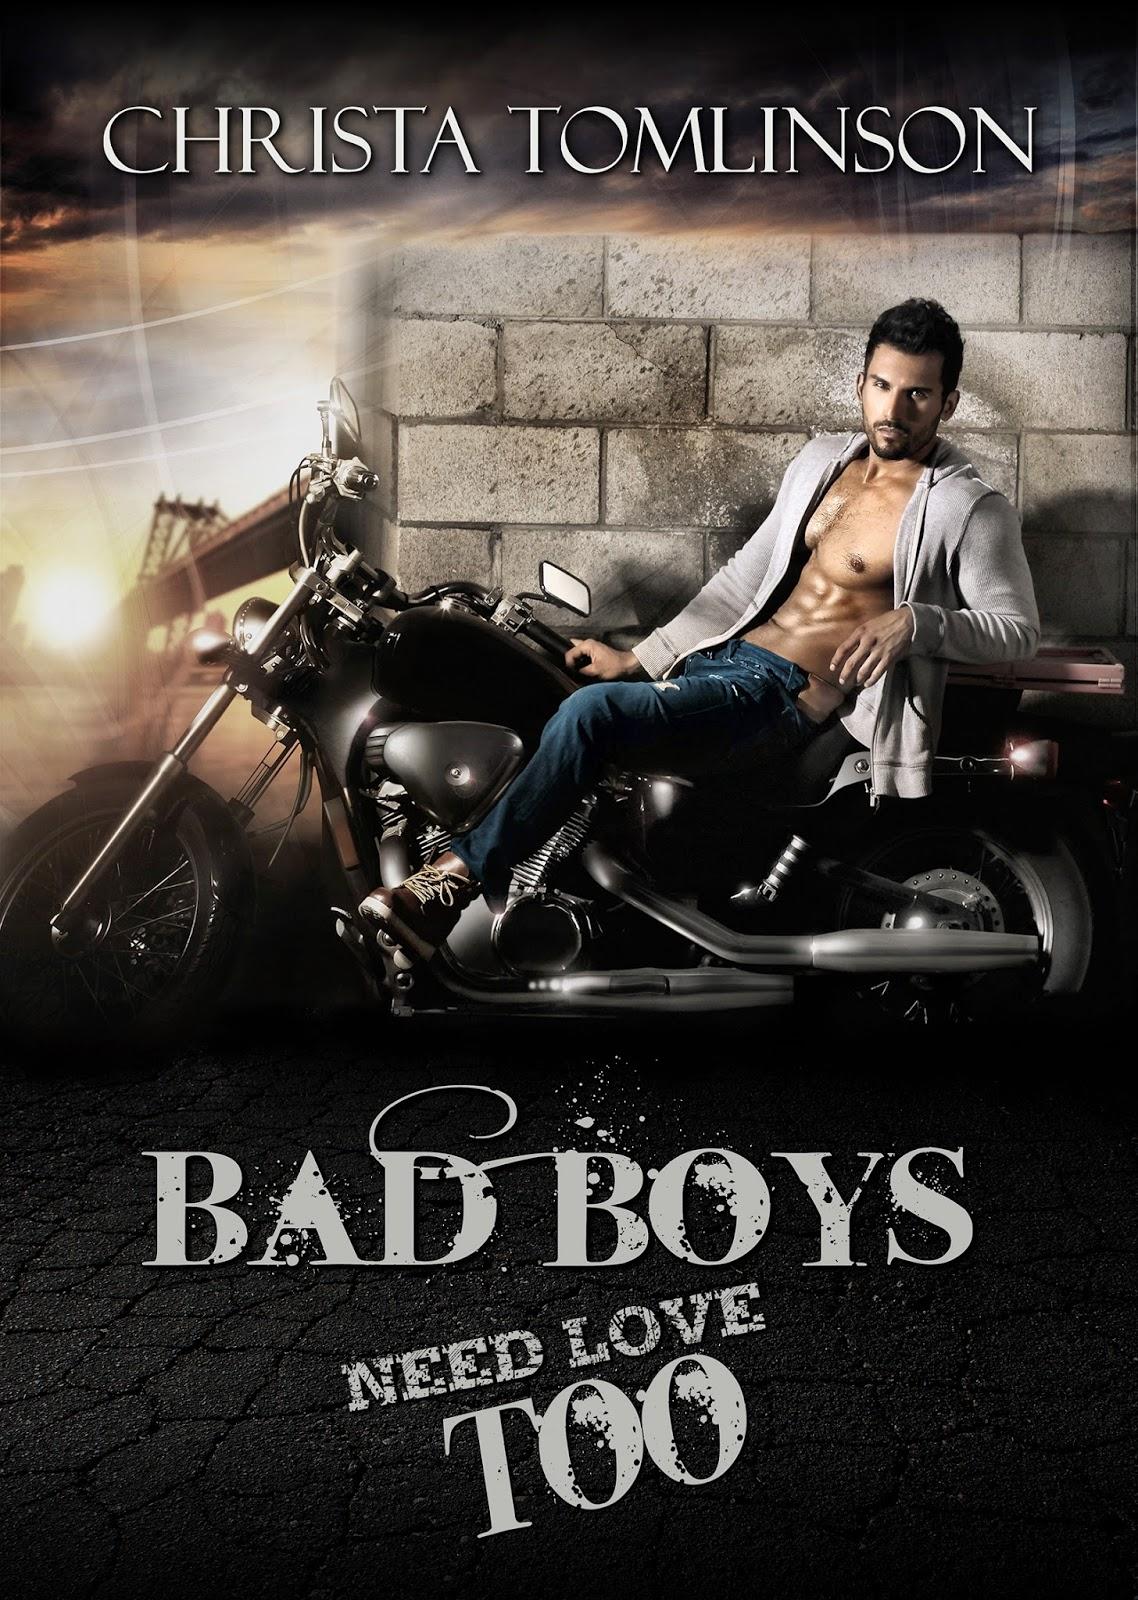 http://www.amazon.com/Bad-Boys-Need-Love-Too-ebook/dp/B00NR6X7YK/ref=sr_1_1?ie=UTF8&qid=1411481633&sr=8-1&keywords=bad+boys+need+love+too